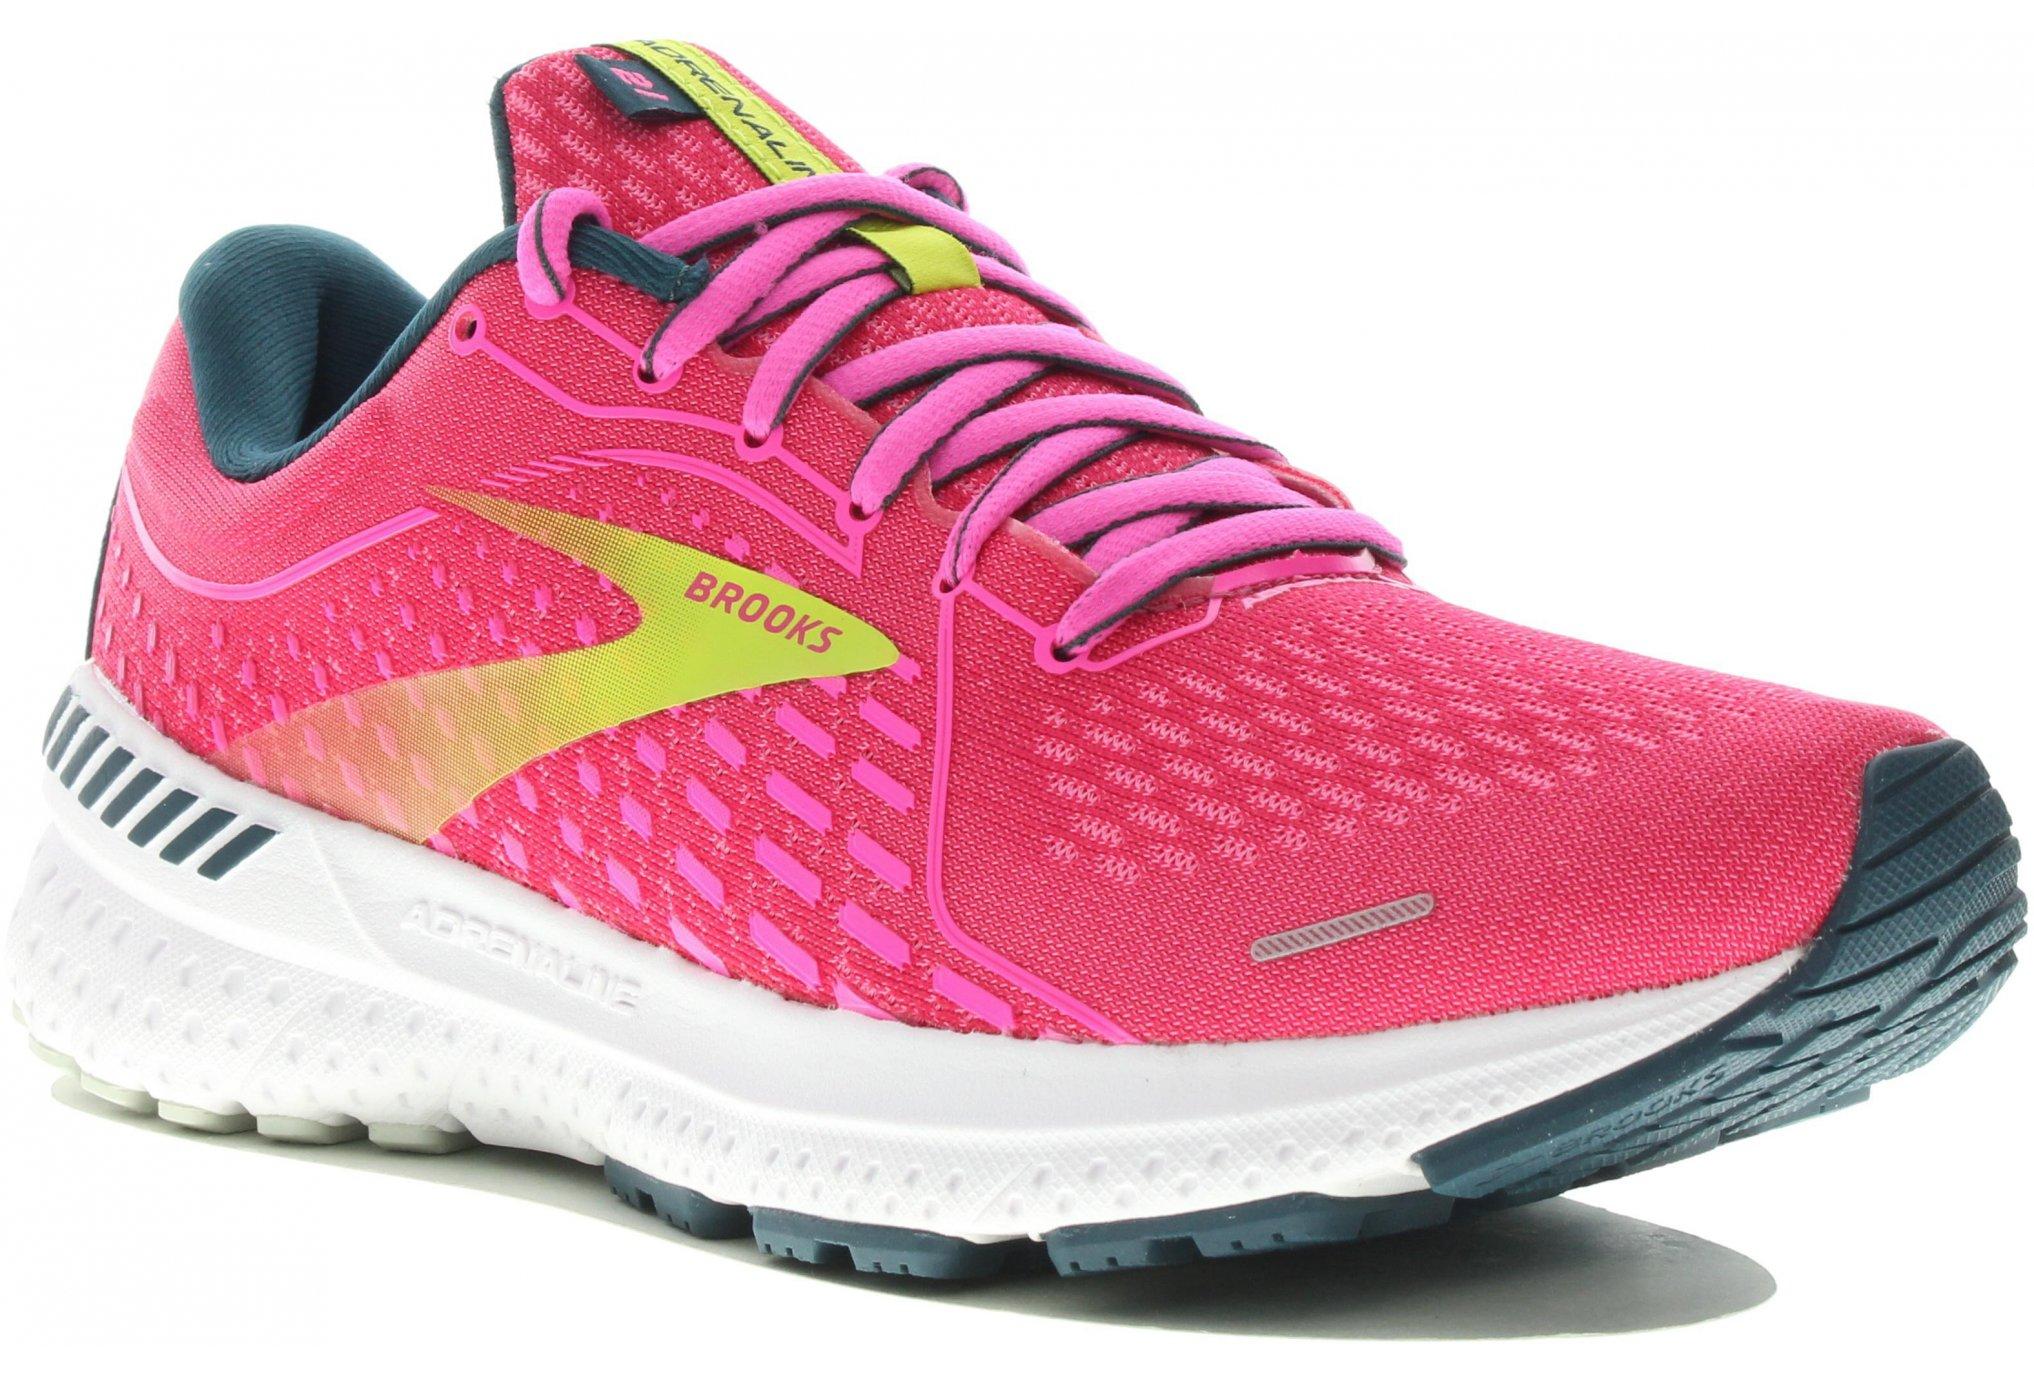 Brooks Adrenaline GTS 21 Chaussures running femme